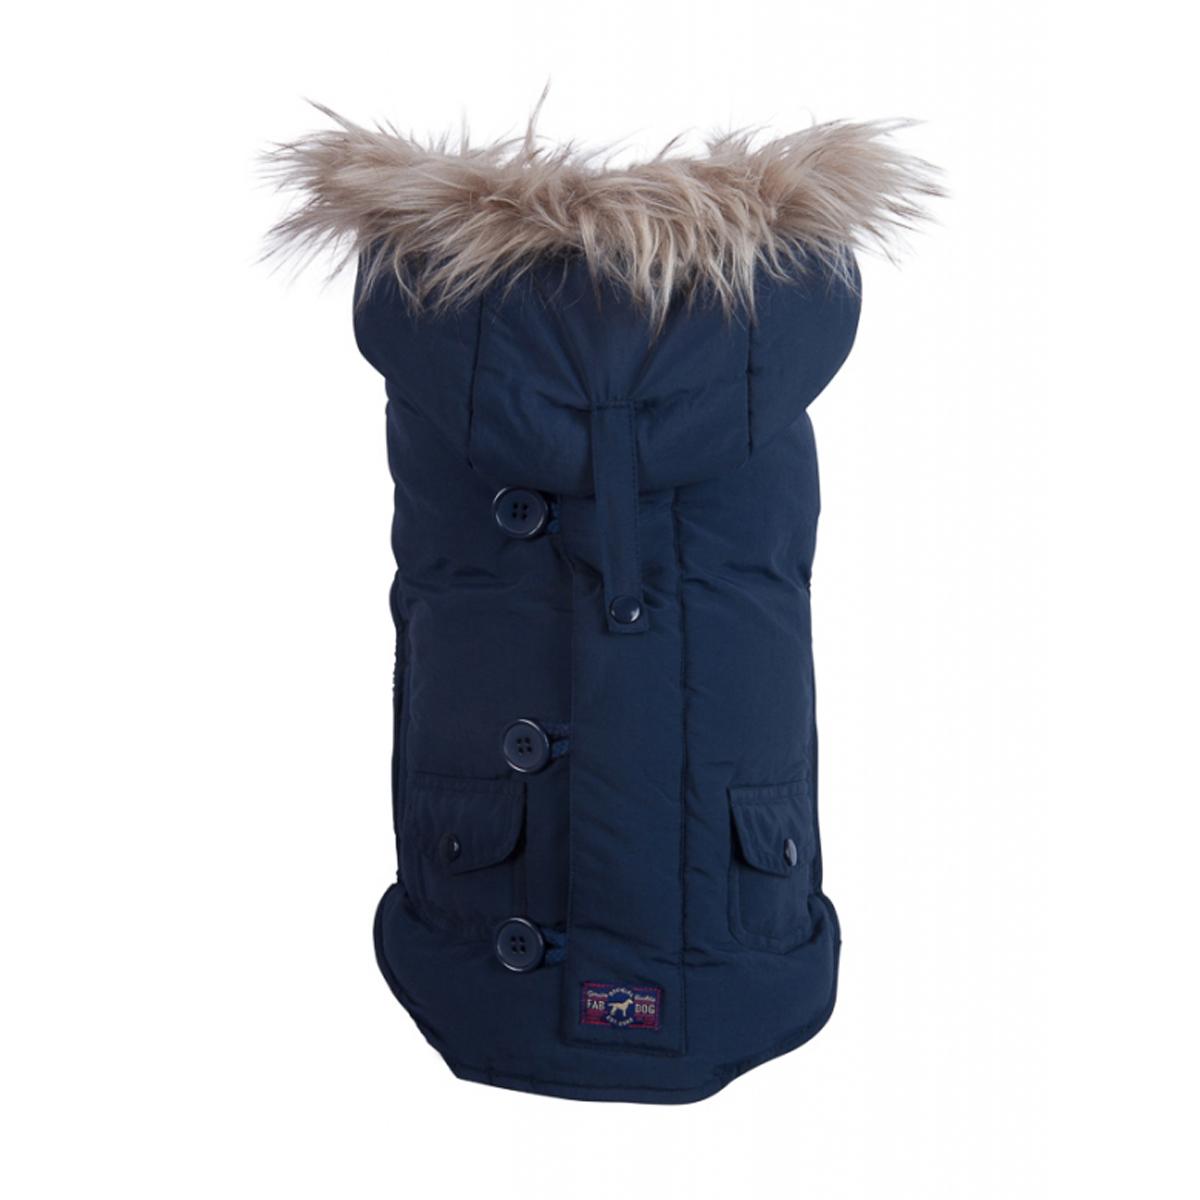 fabdog® Snorkel Dog Jacket - Navy